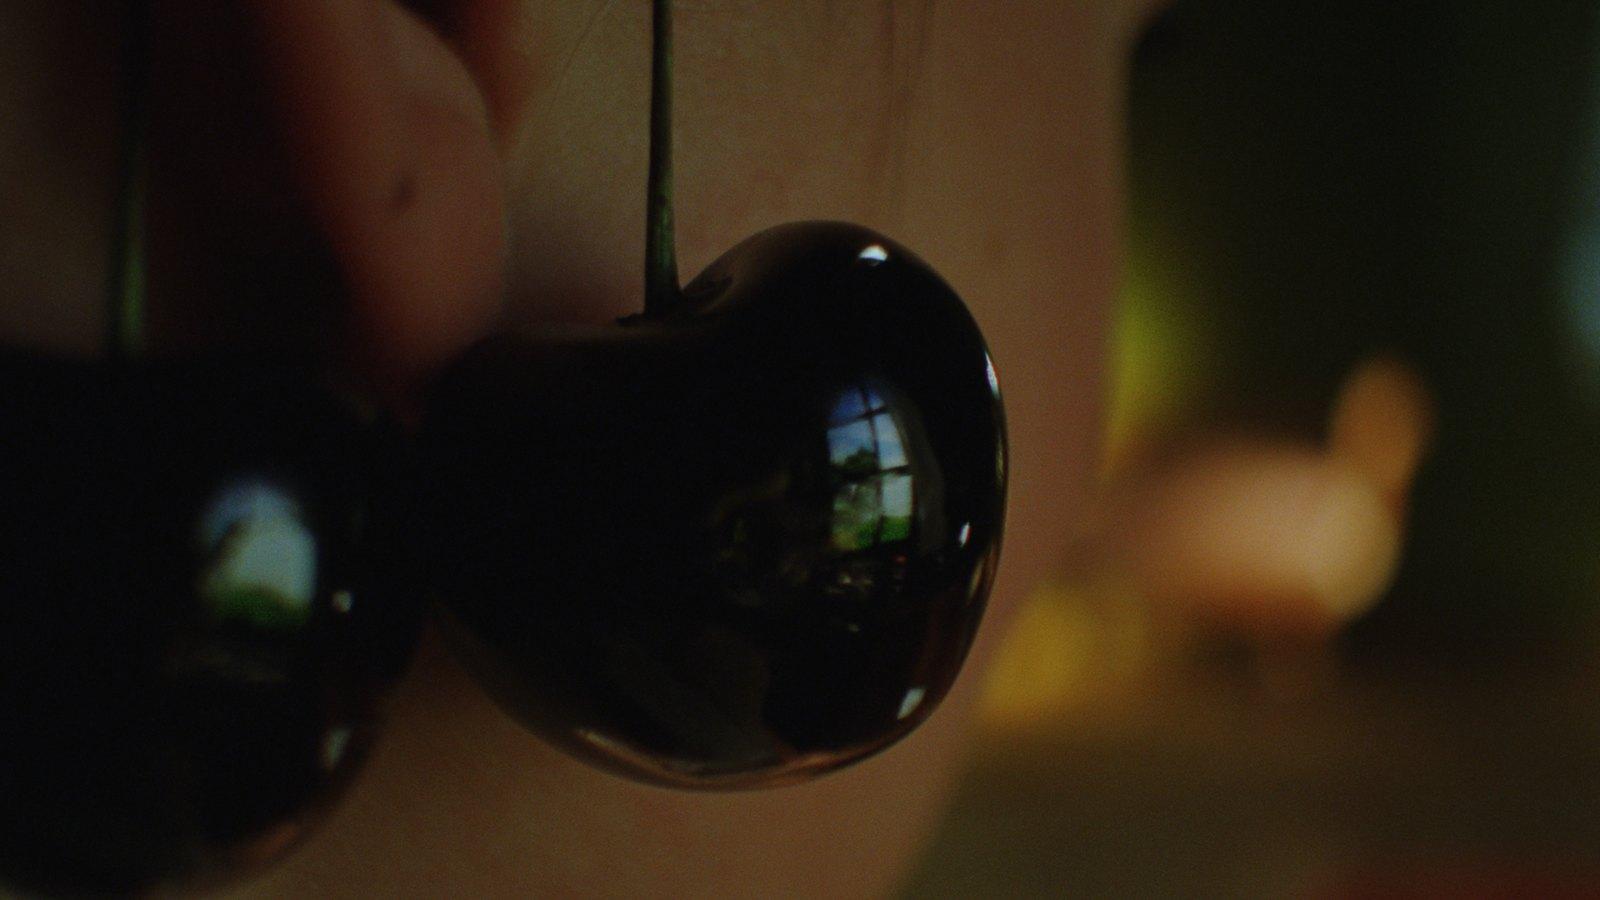 Still from Kersentijd (Cherry season), 2012, 35mm film loop, 2'25'', digitally projected